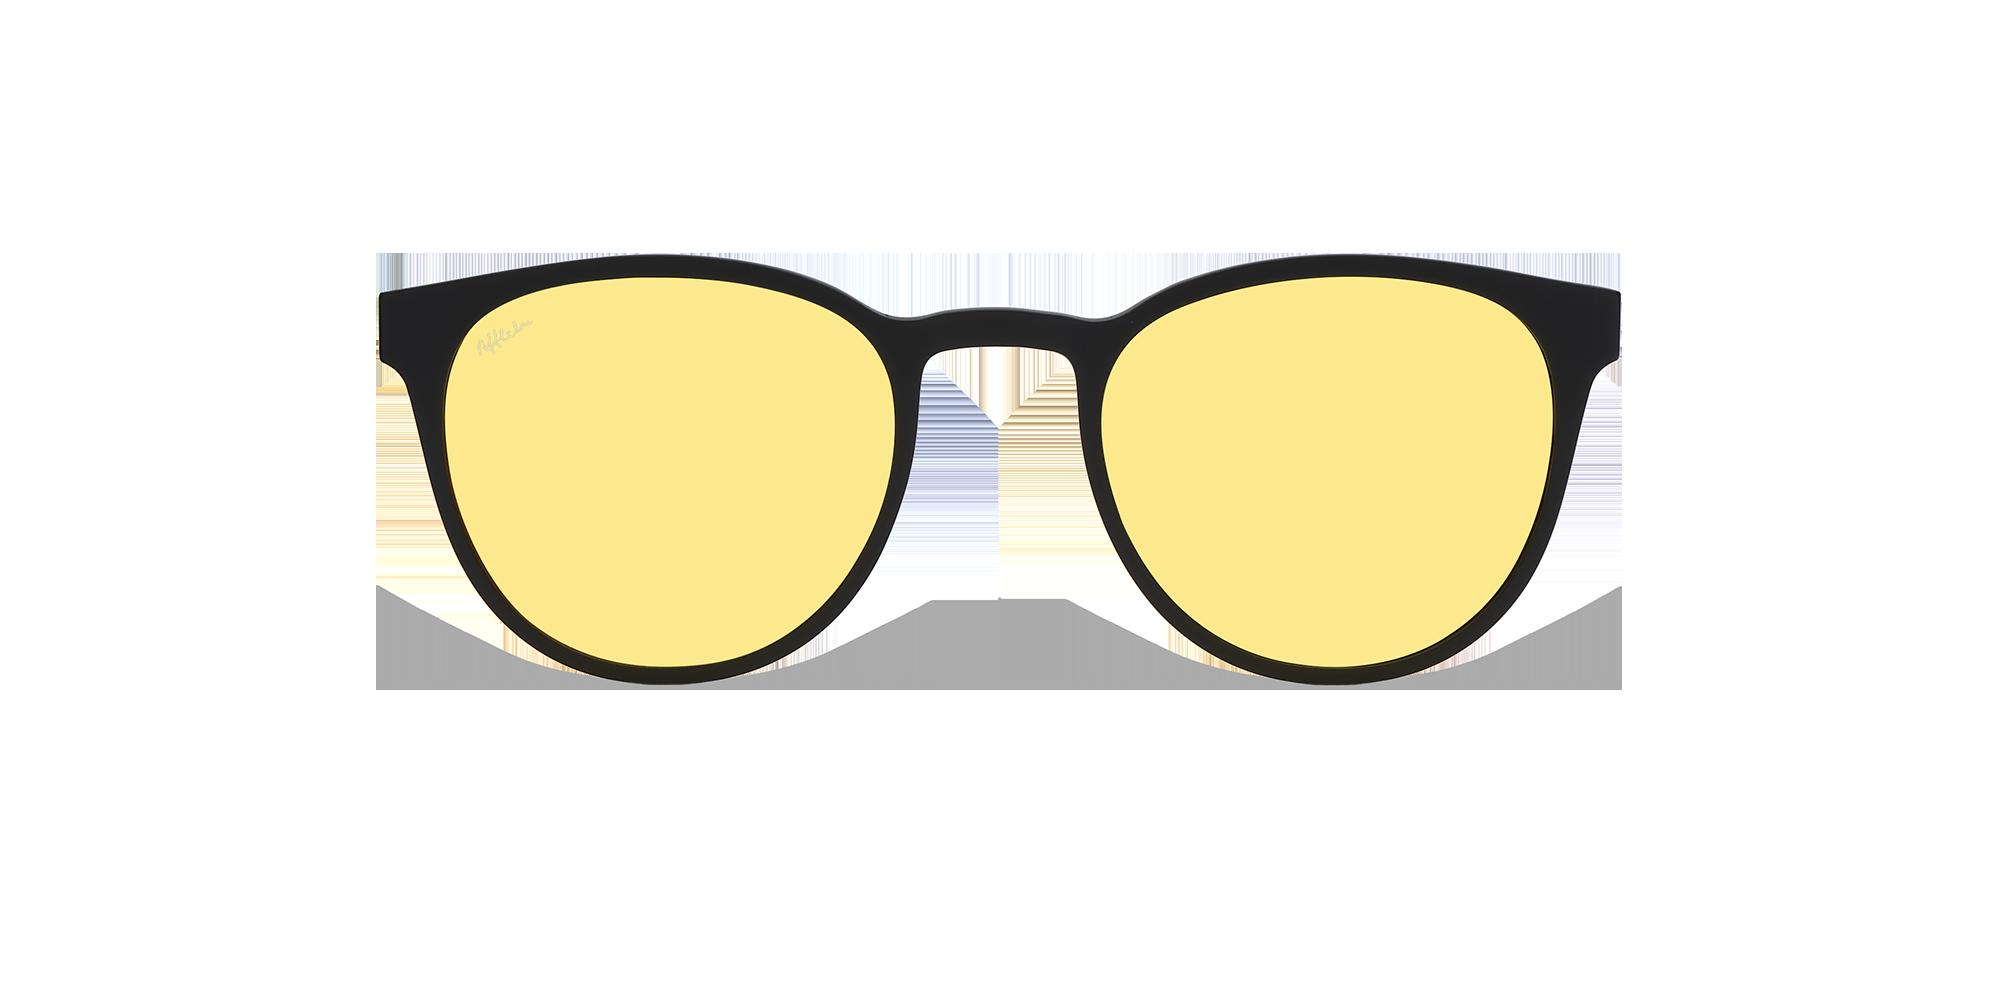 afflelou/france/products/smart_clip/clips_glasses/TMK44YEBK014920.png